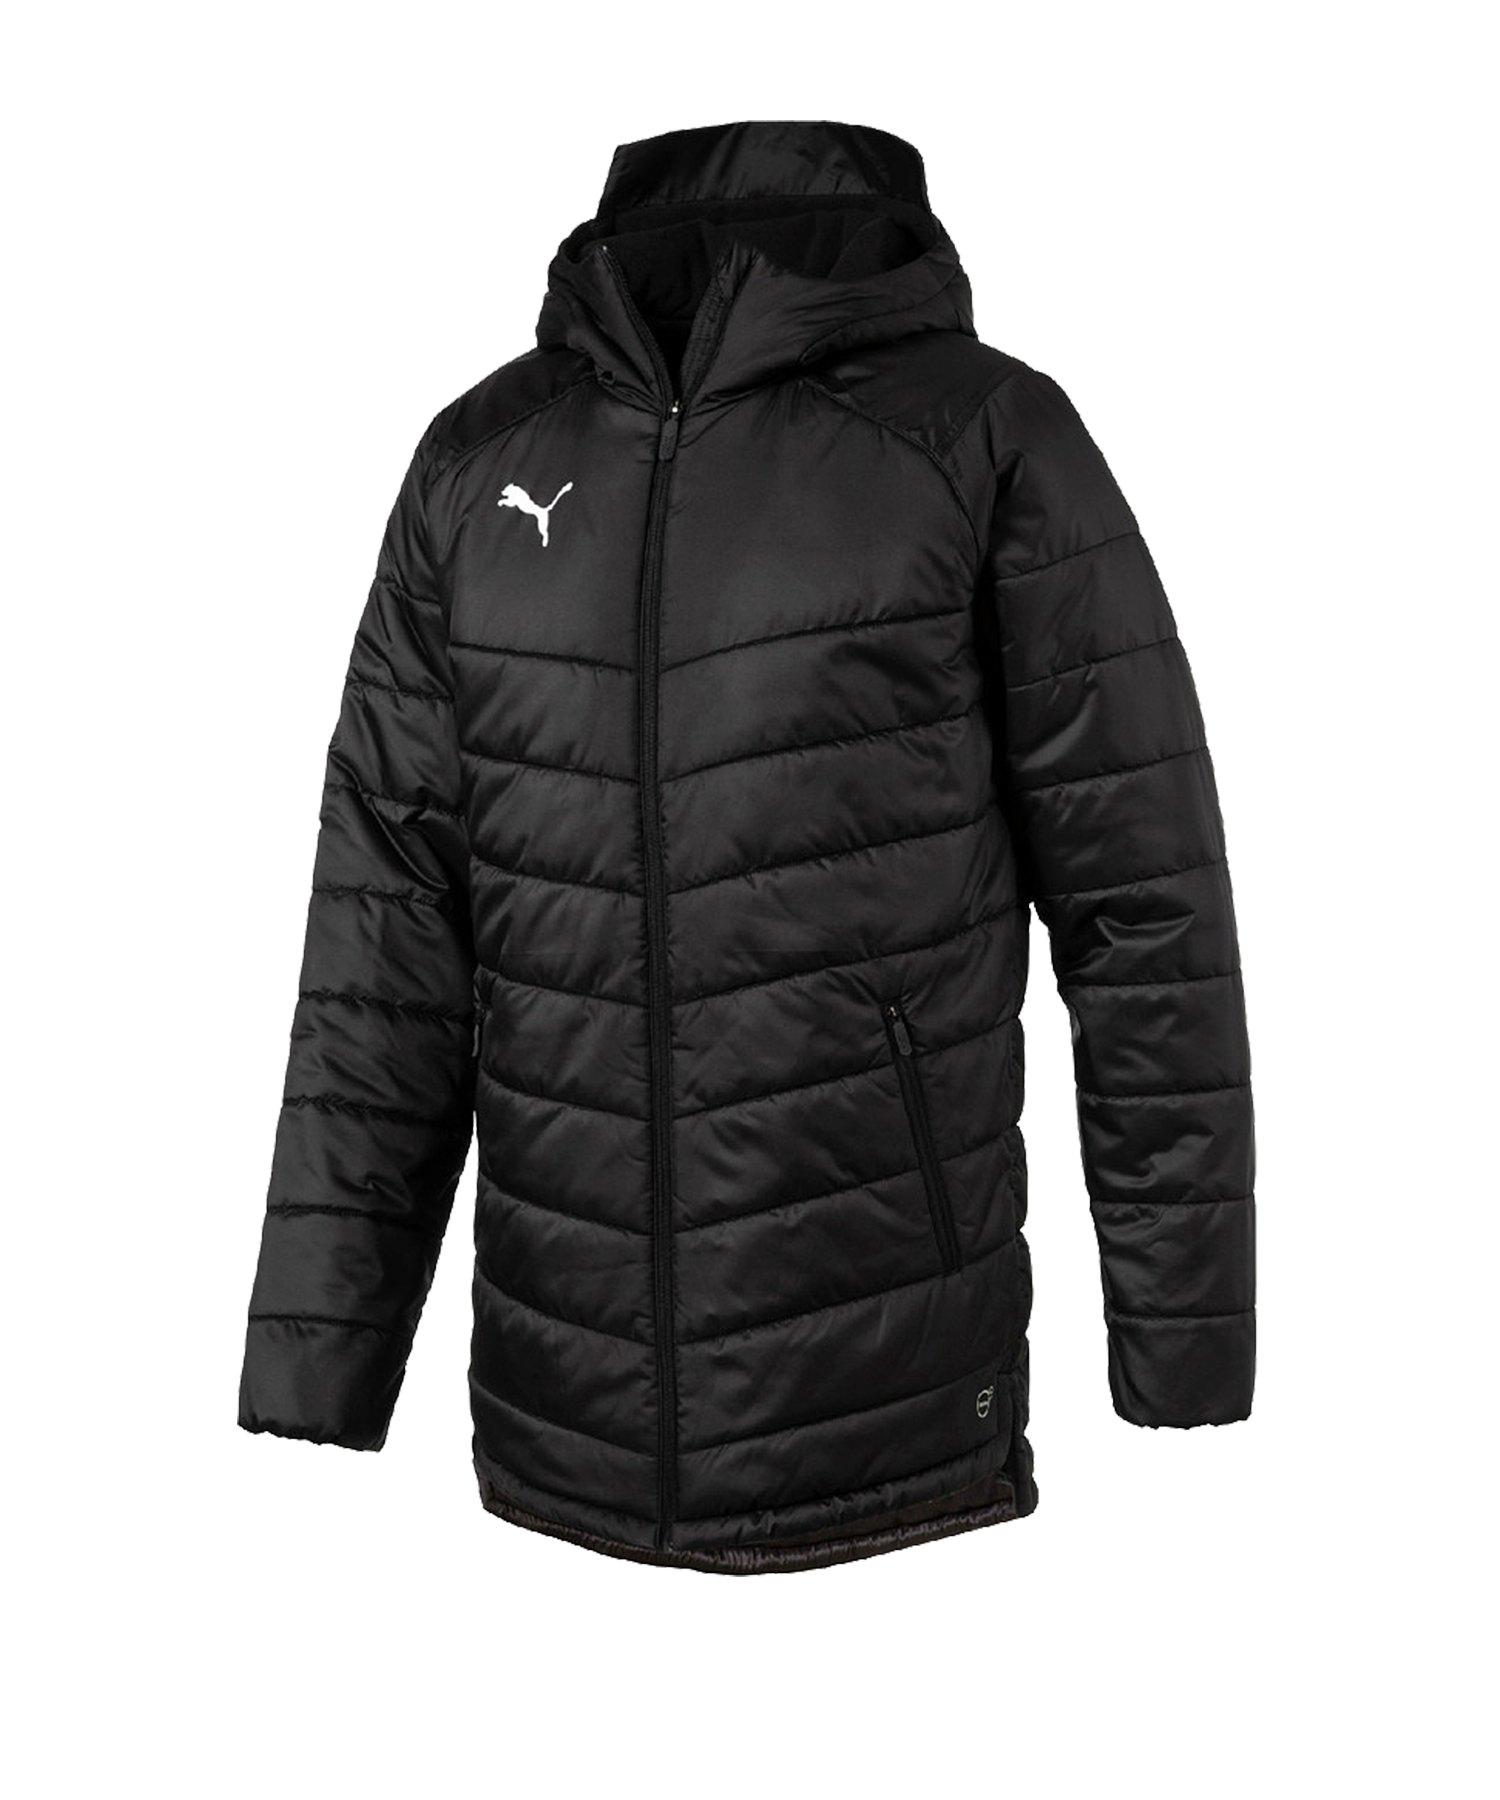 PUMA LIGA Sideline Bench Jacket Coachjacke F03 - schwarz